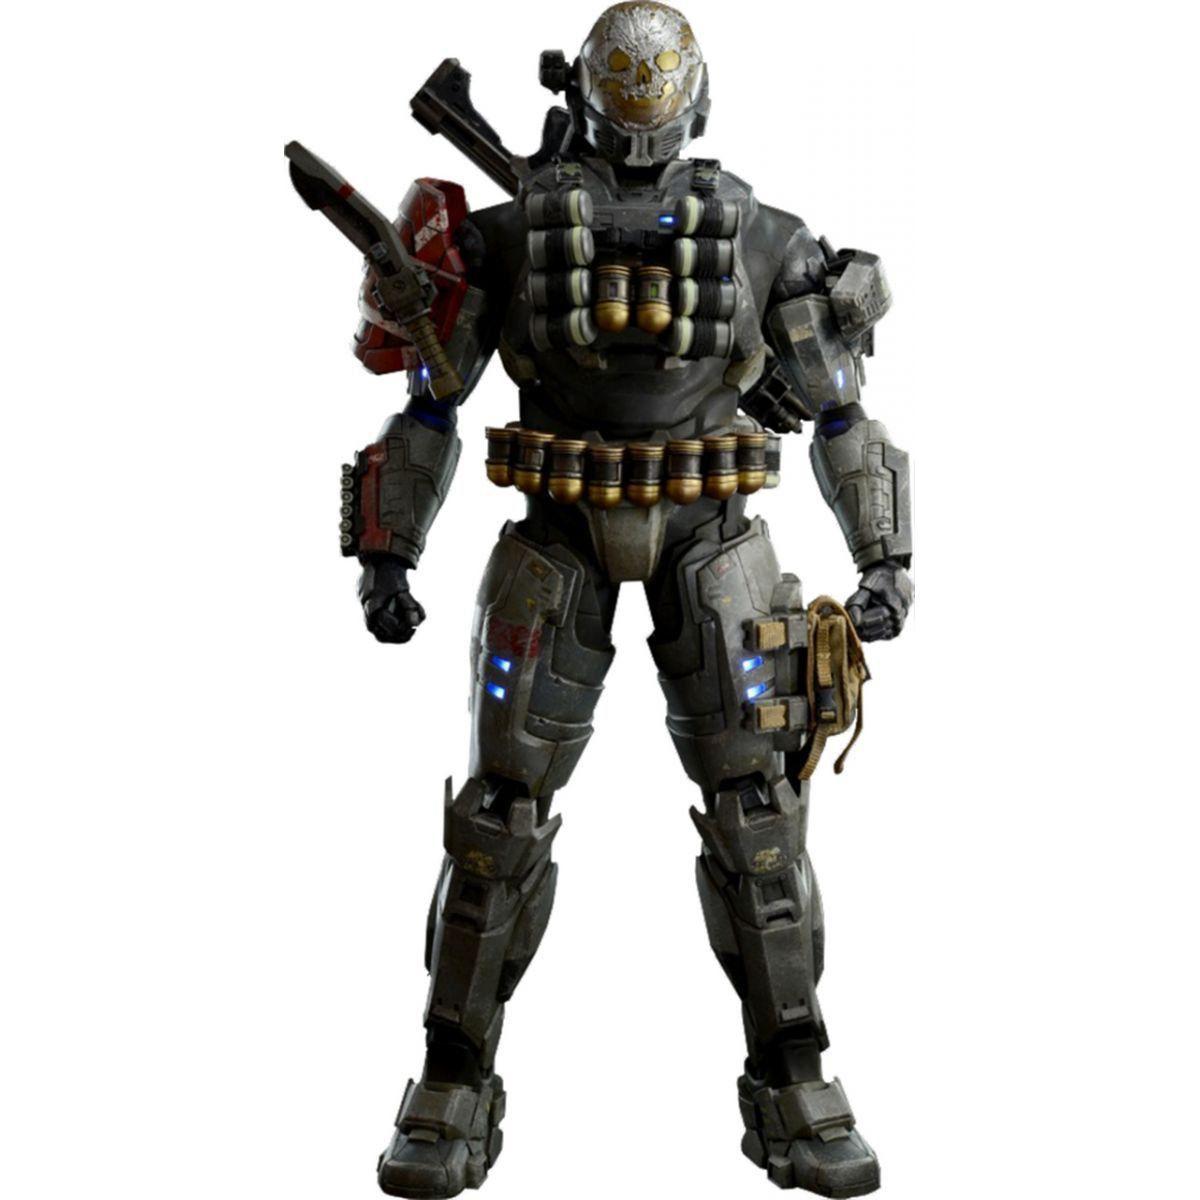 Boneco Emile Spartan III: Halo Reach Escala 1/6 - ThreeA - CD